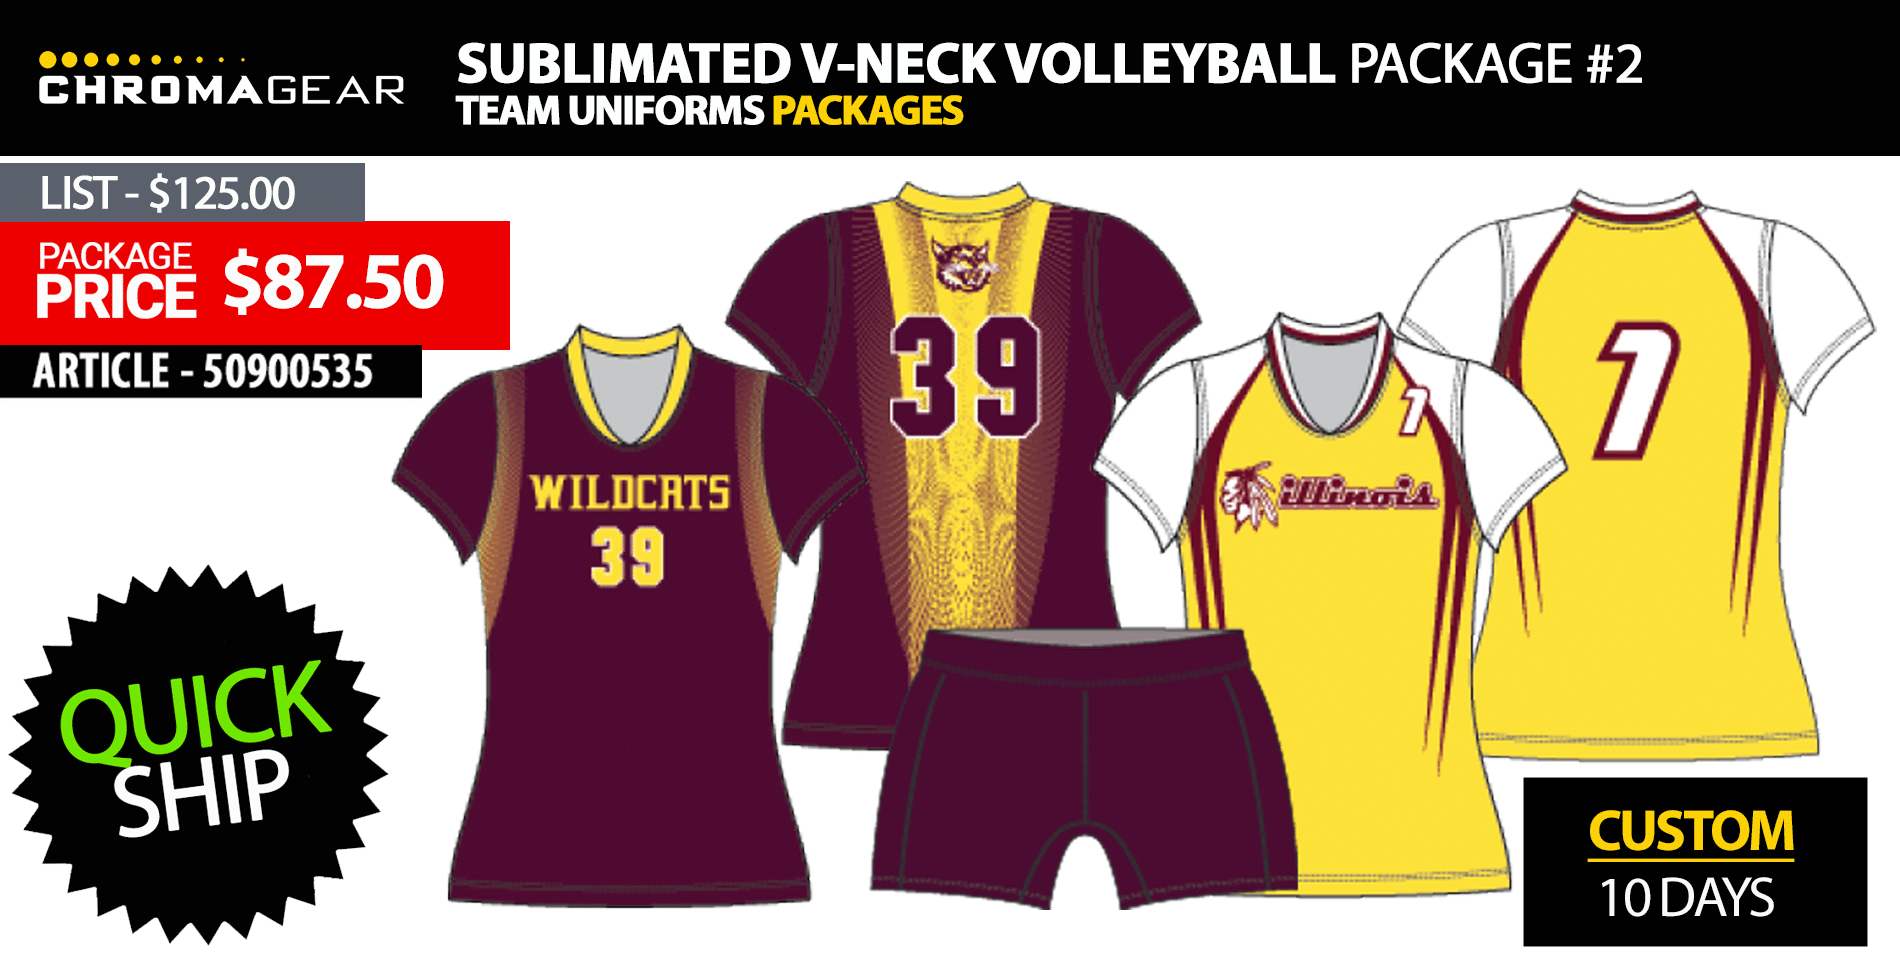 Adidas Quickset Long Sleeve Volleyball Uniform Package